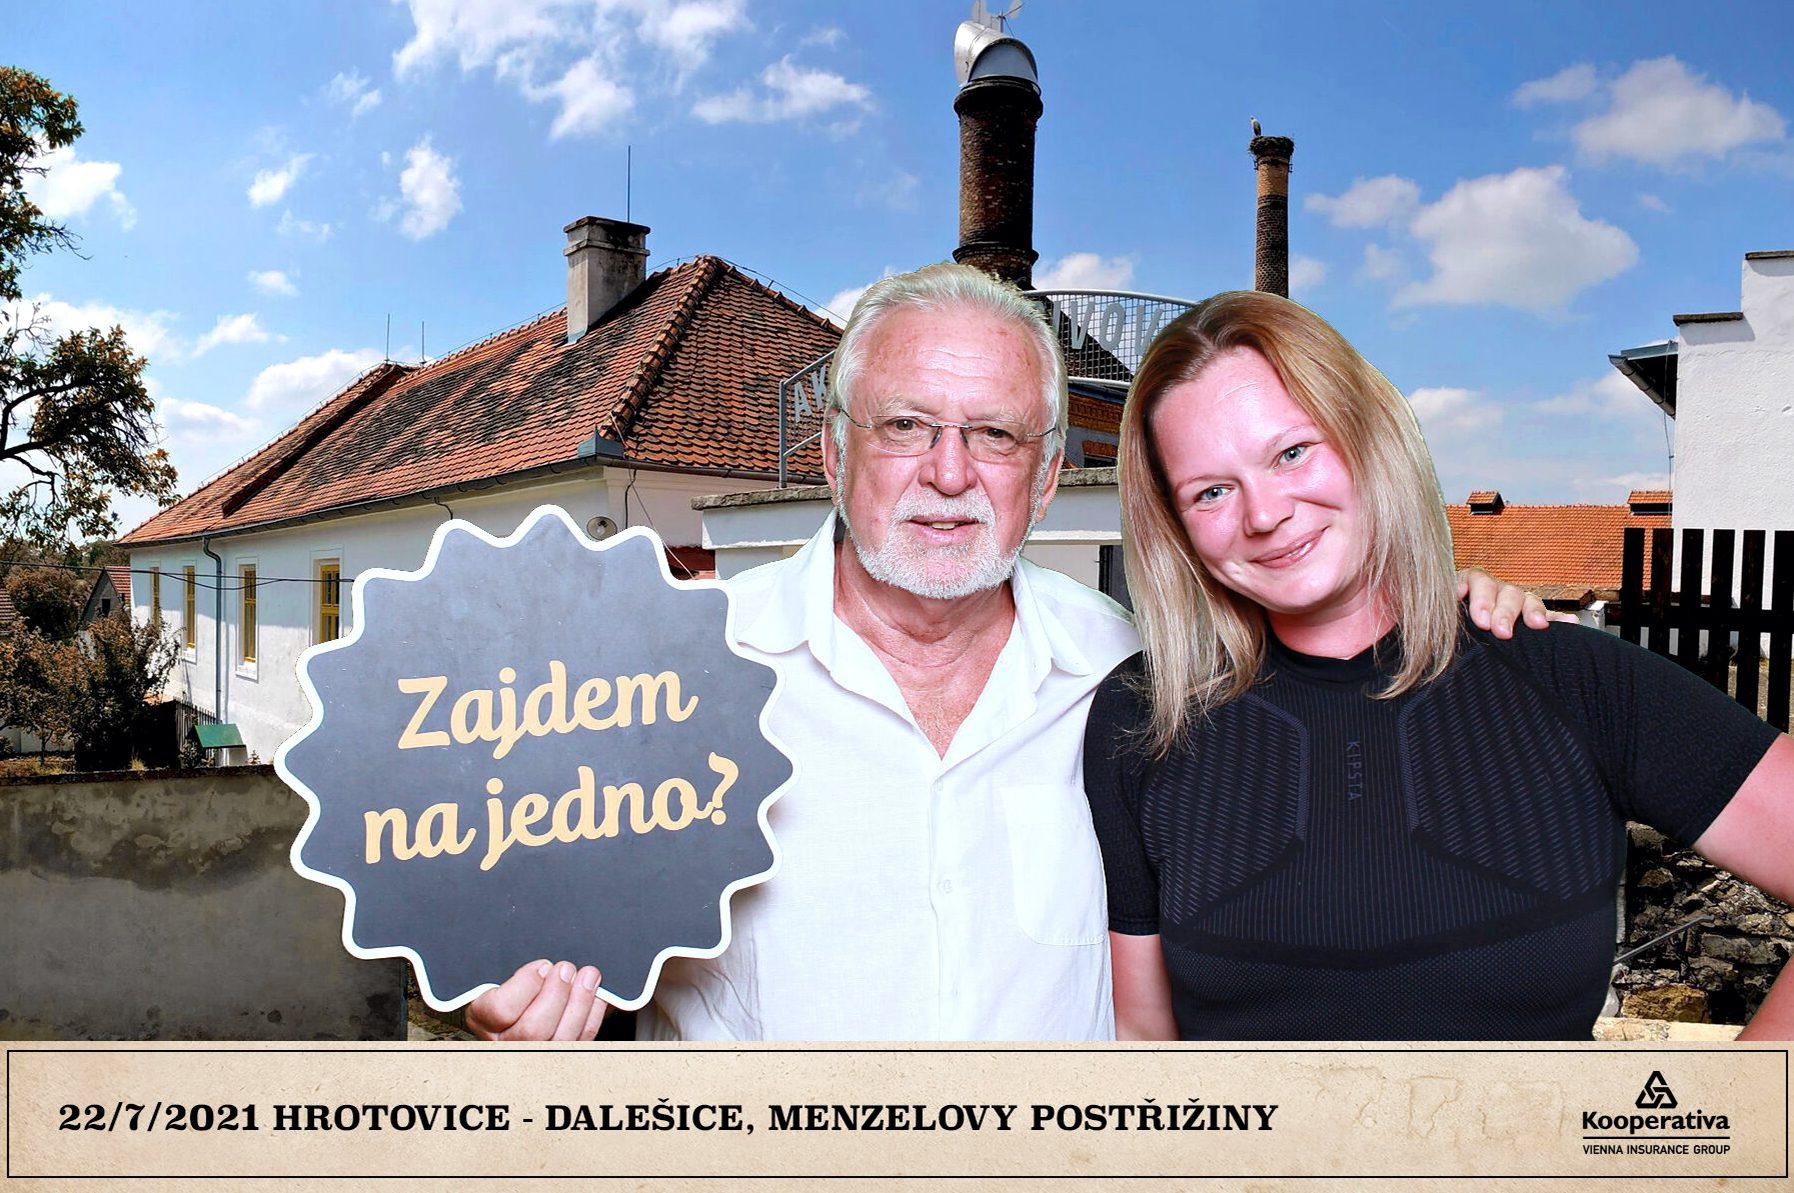 fotokoutek-firemni-vecirek-oslava-kooperativa-menzelovy-postriziny-22-7-2021-737759